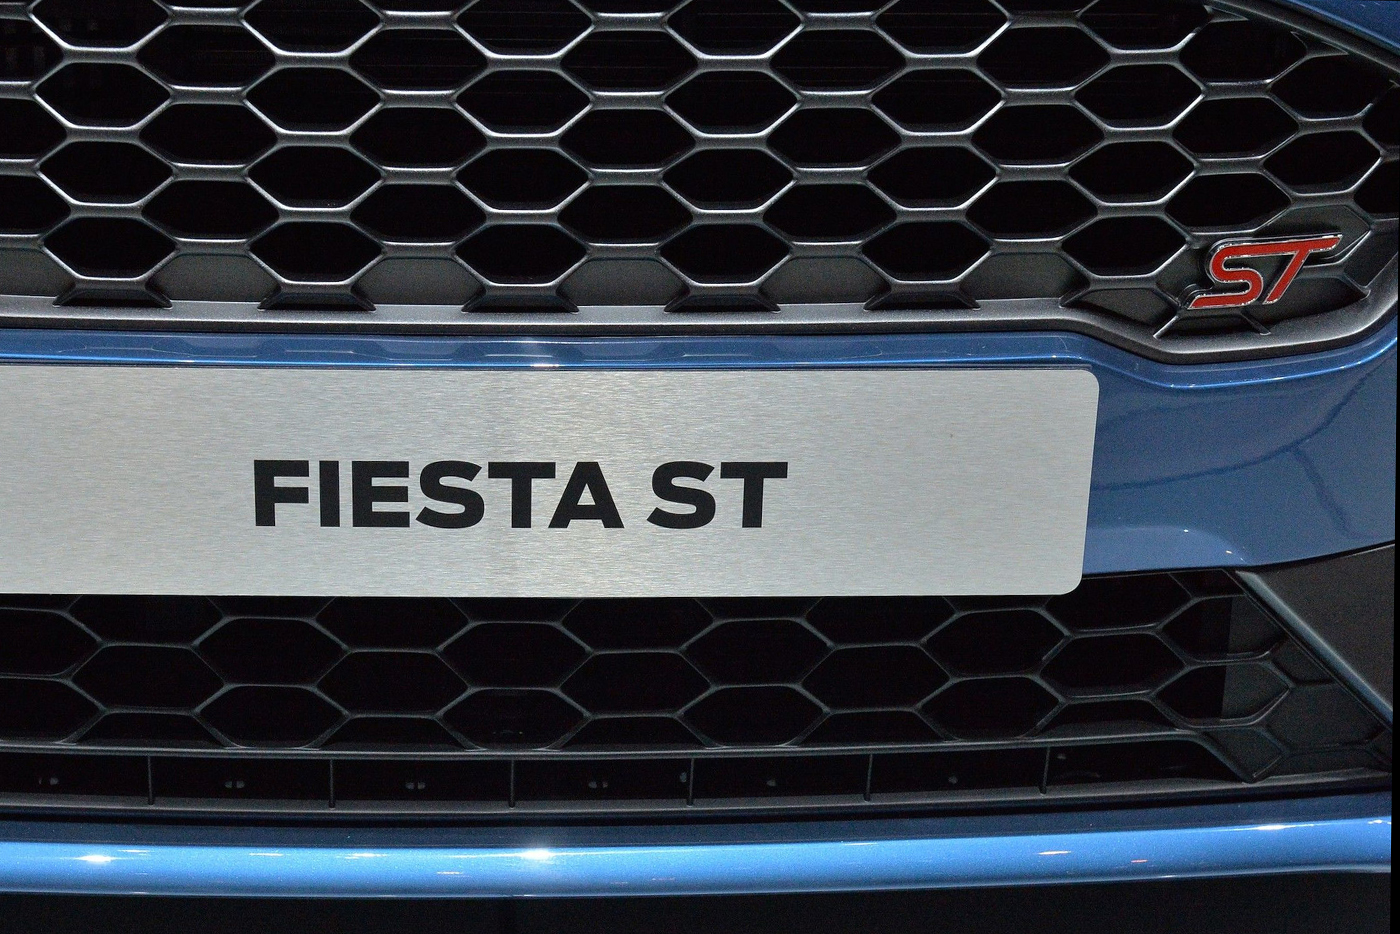 2018-ford-fiesta-st-12.jpg